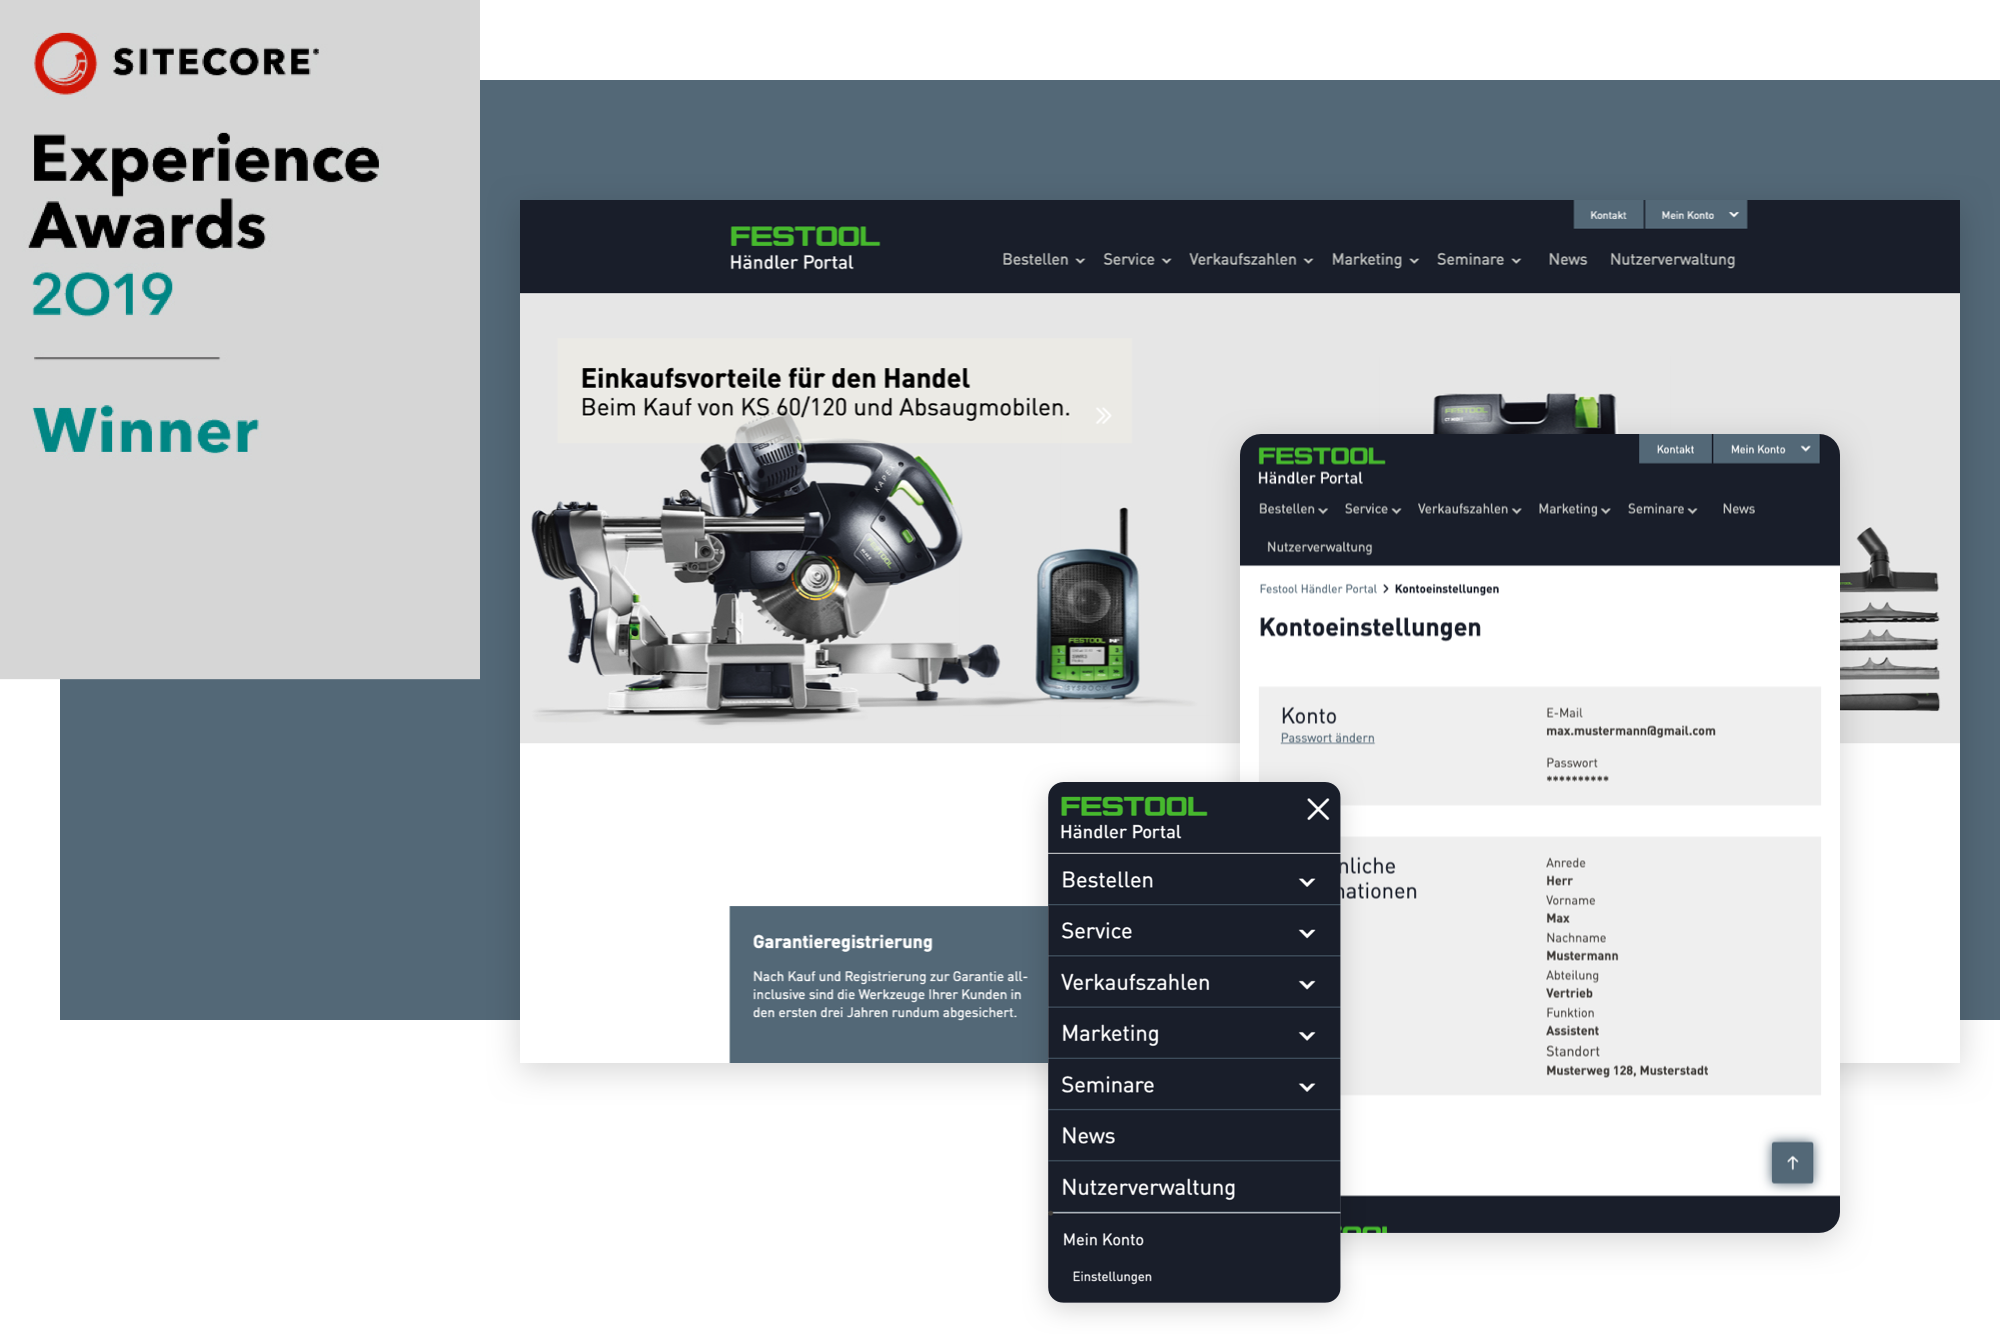 Sitecore Experience Award 2019 netzkern und Festool